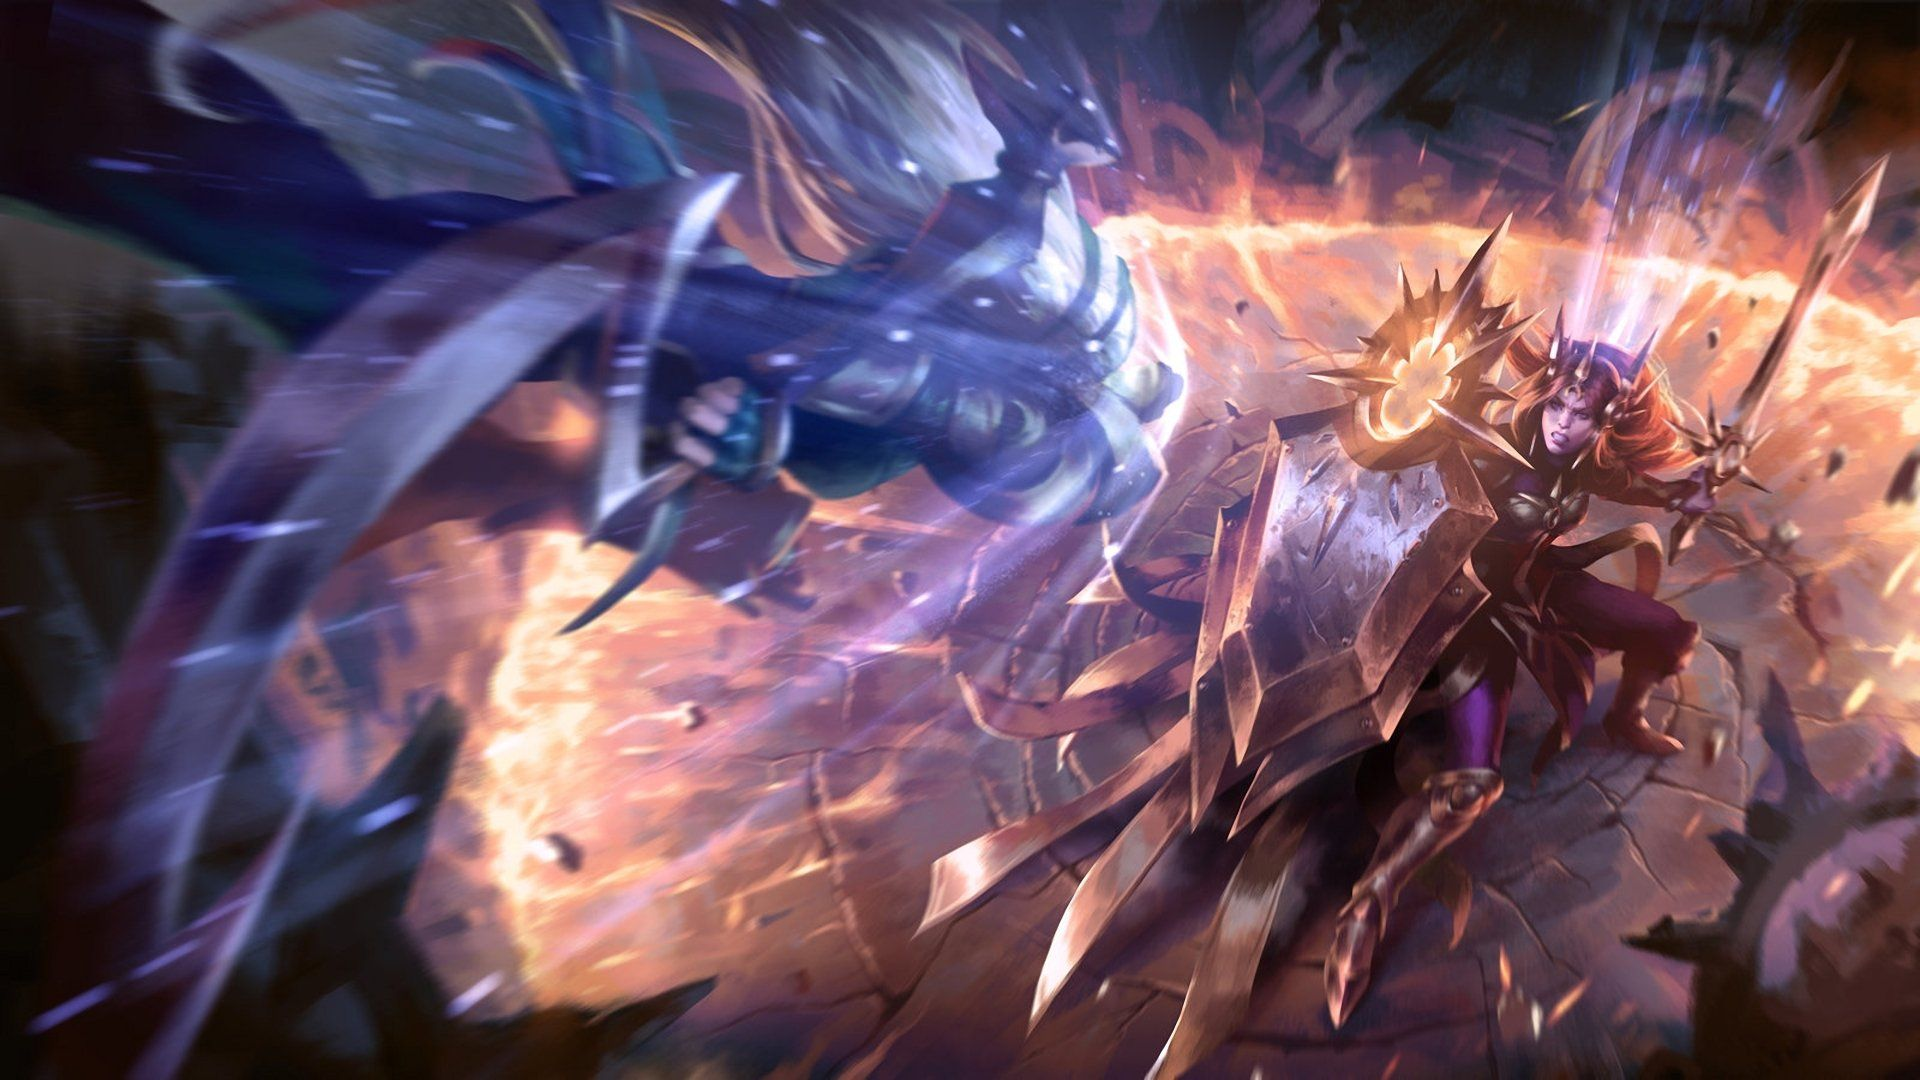 Video Game League Of Legends Battle Sword Shield Leona League Of Legends Diana League Of Legends Wallpaper